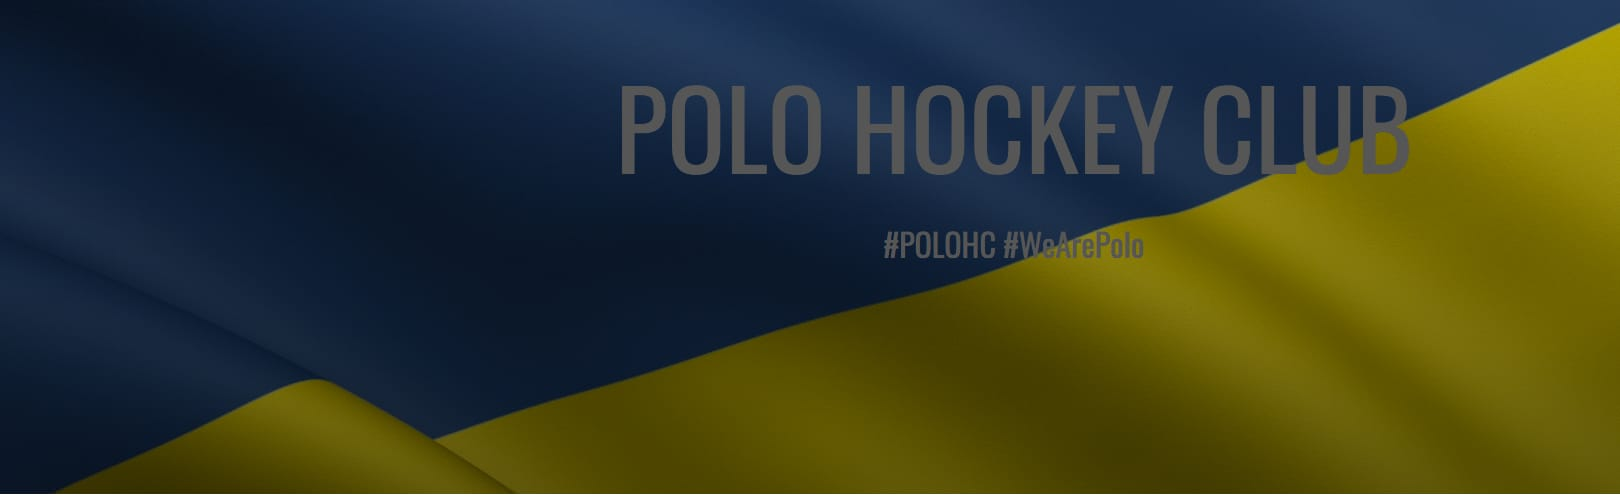 POLO Hockey Club Marcq en Baroeul